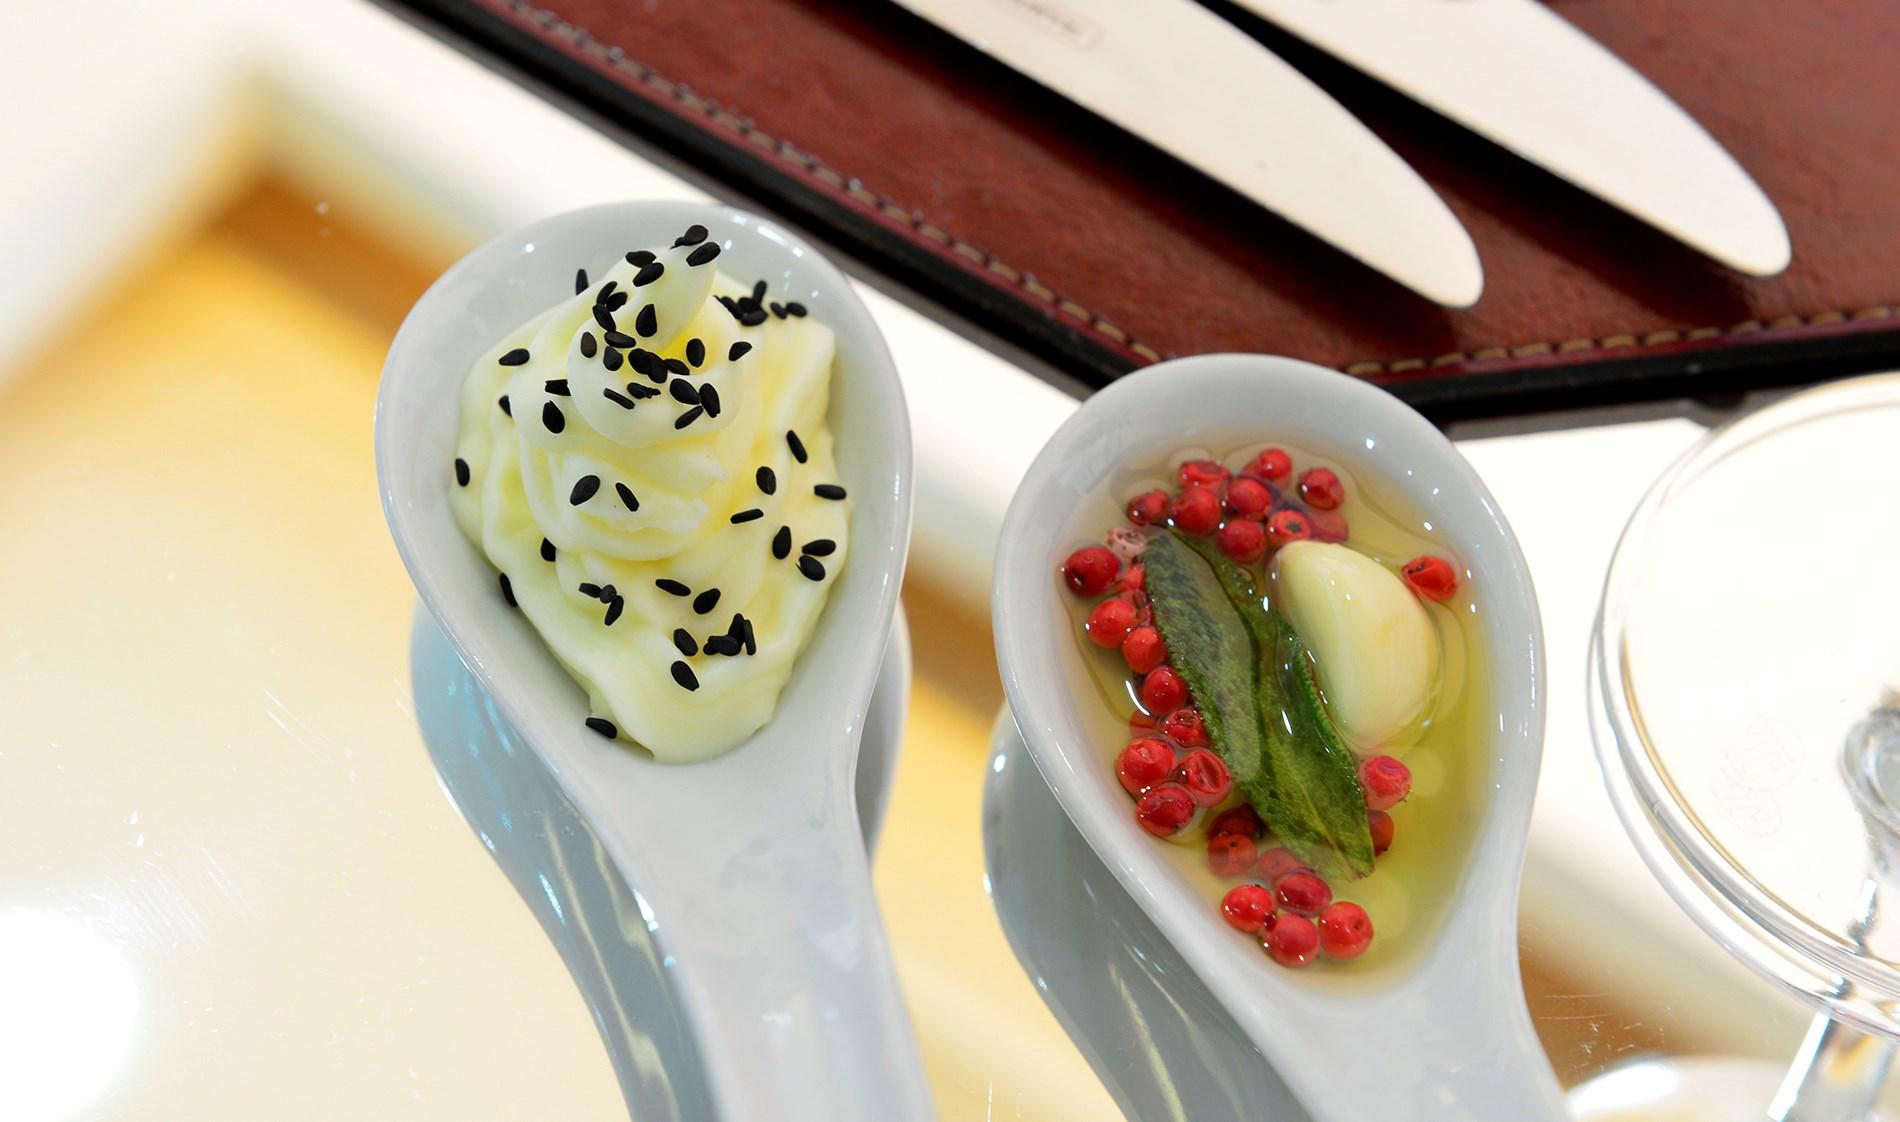 pestana-curitiba-restaurant-8